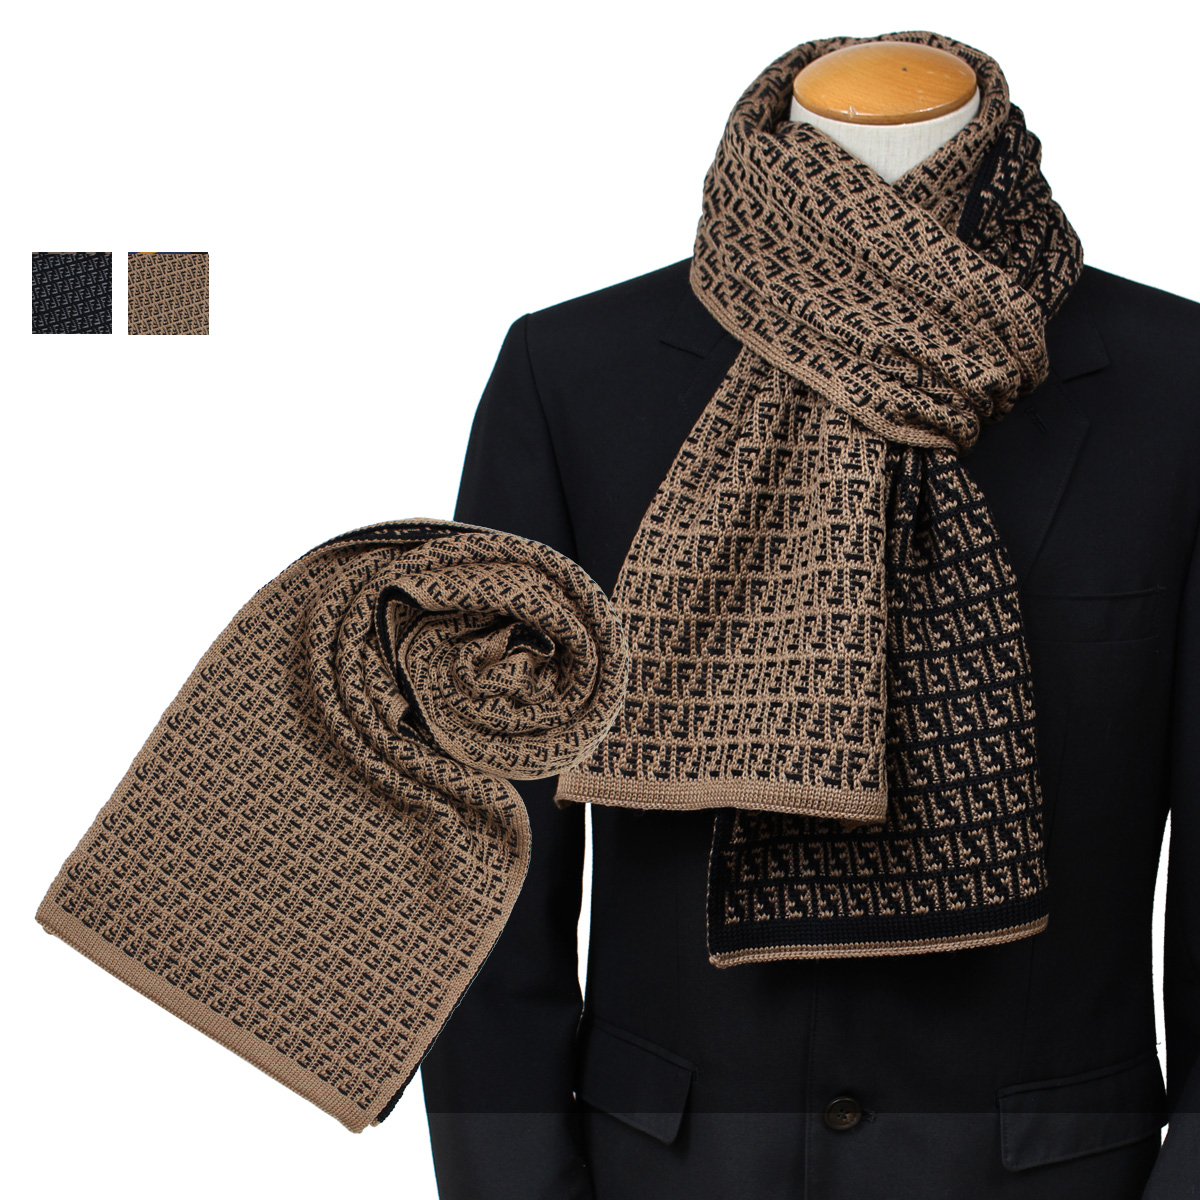 6059556d4e3 ... new zealand fendi fxs124 i17 fendi scarf men wool black brown 9 26  shinnyu load 189